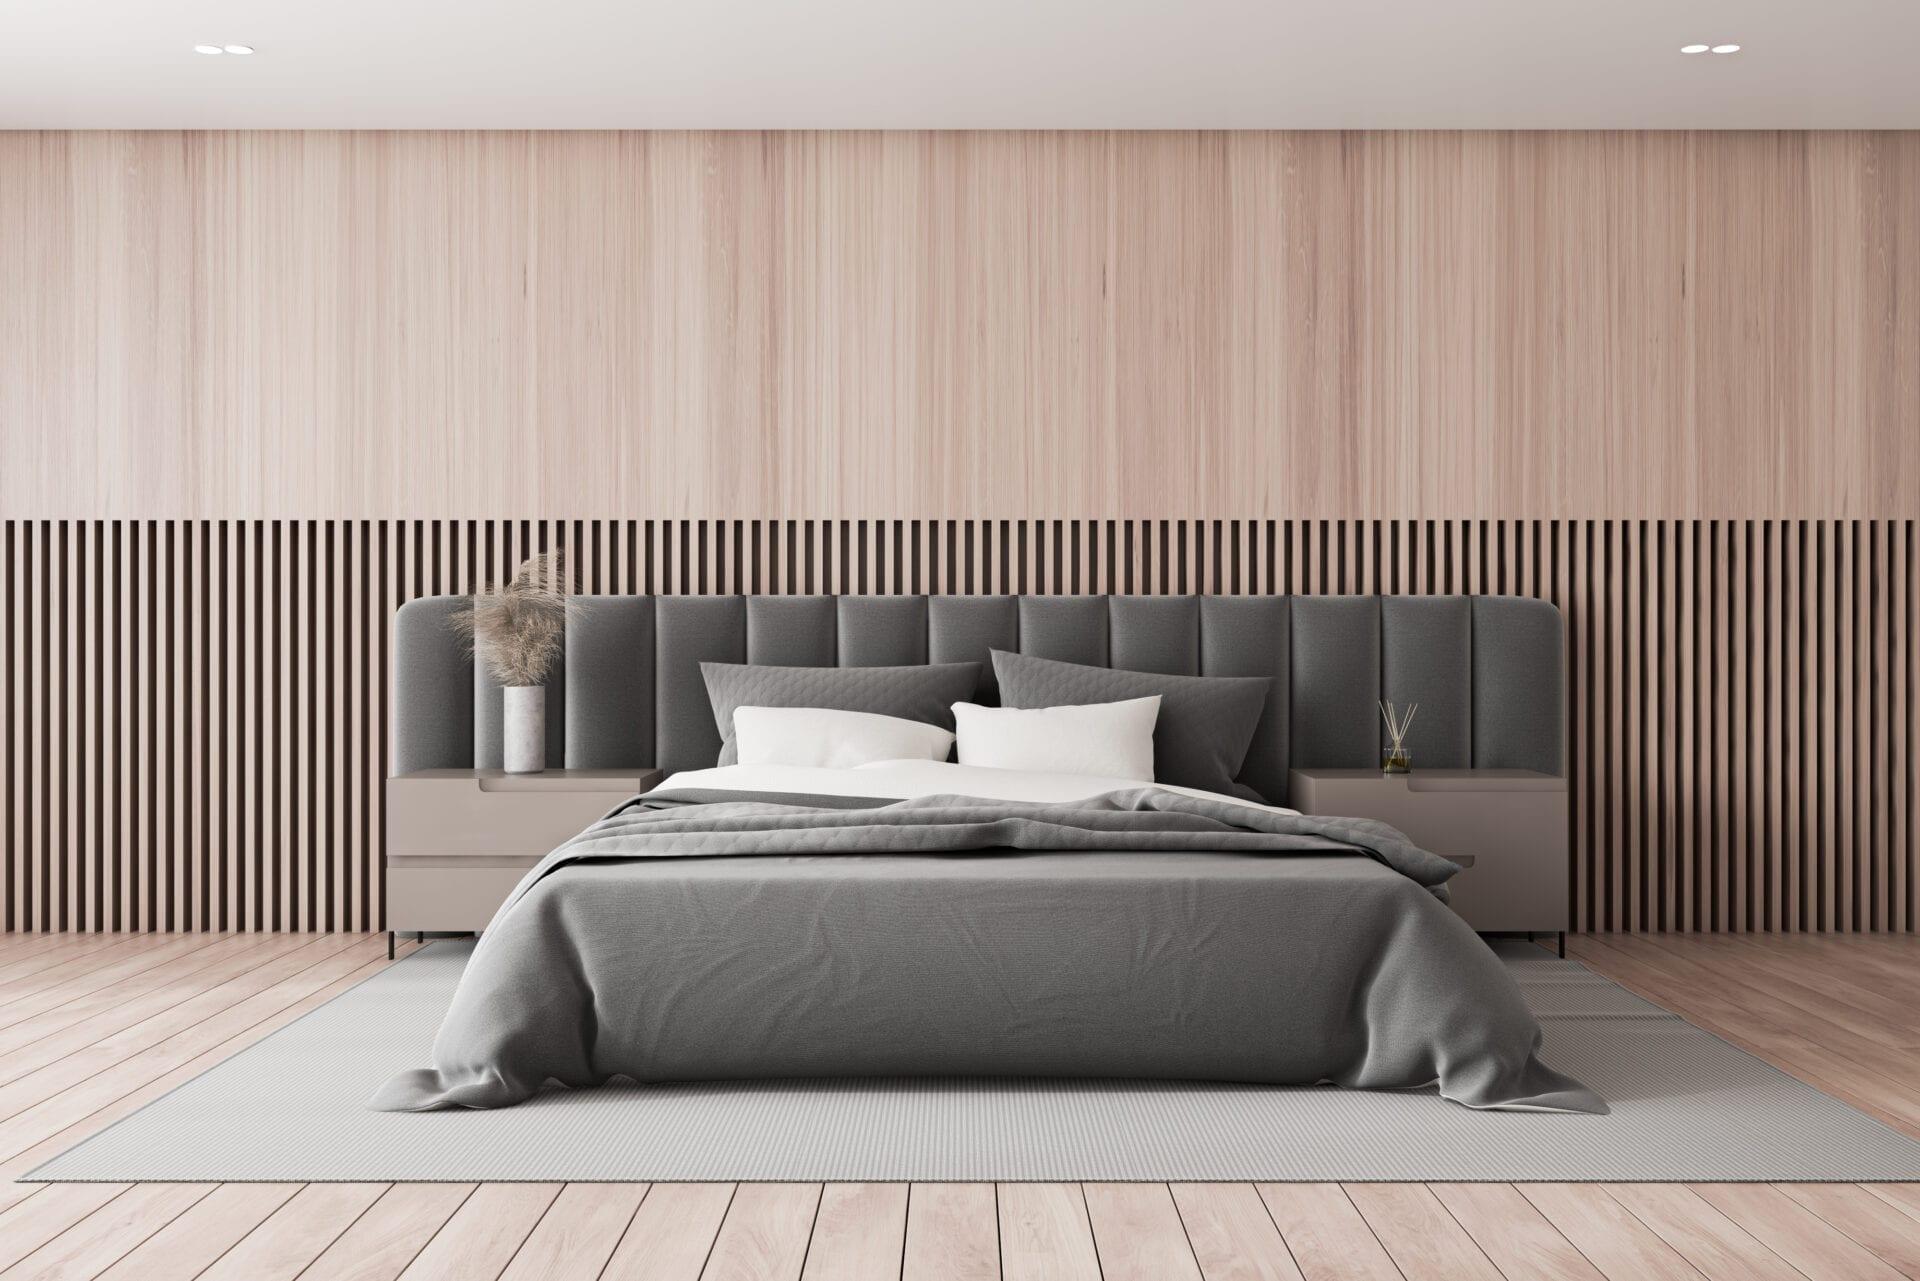 Custom Bedroom Furniture - Luxury Headboard with Upholstered Wall Panels | Blend Home Furnishings